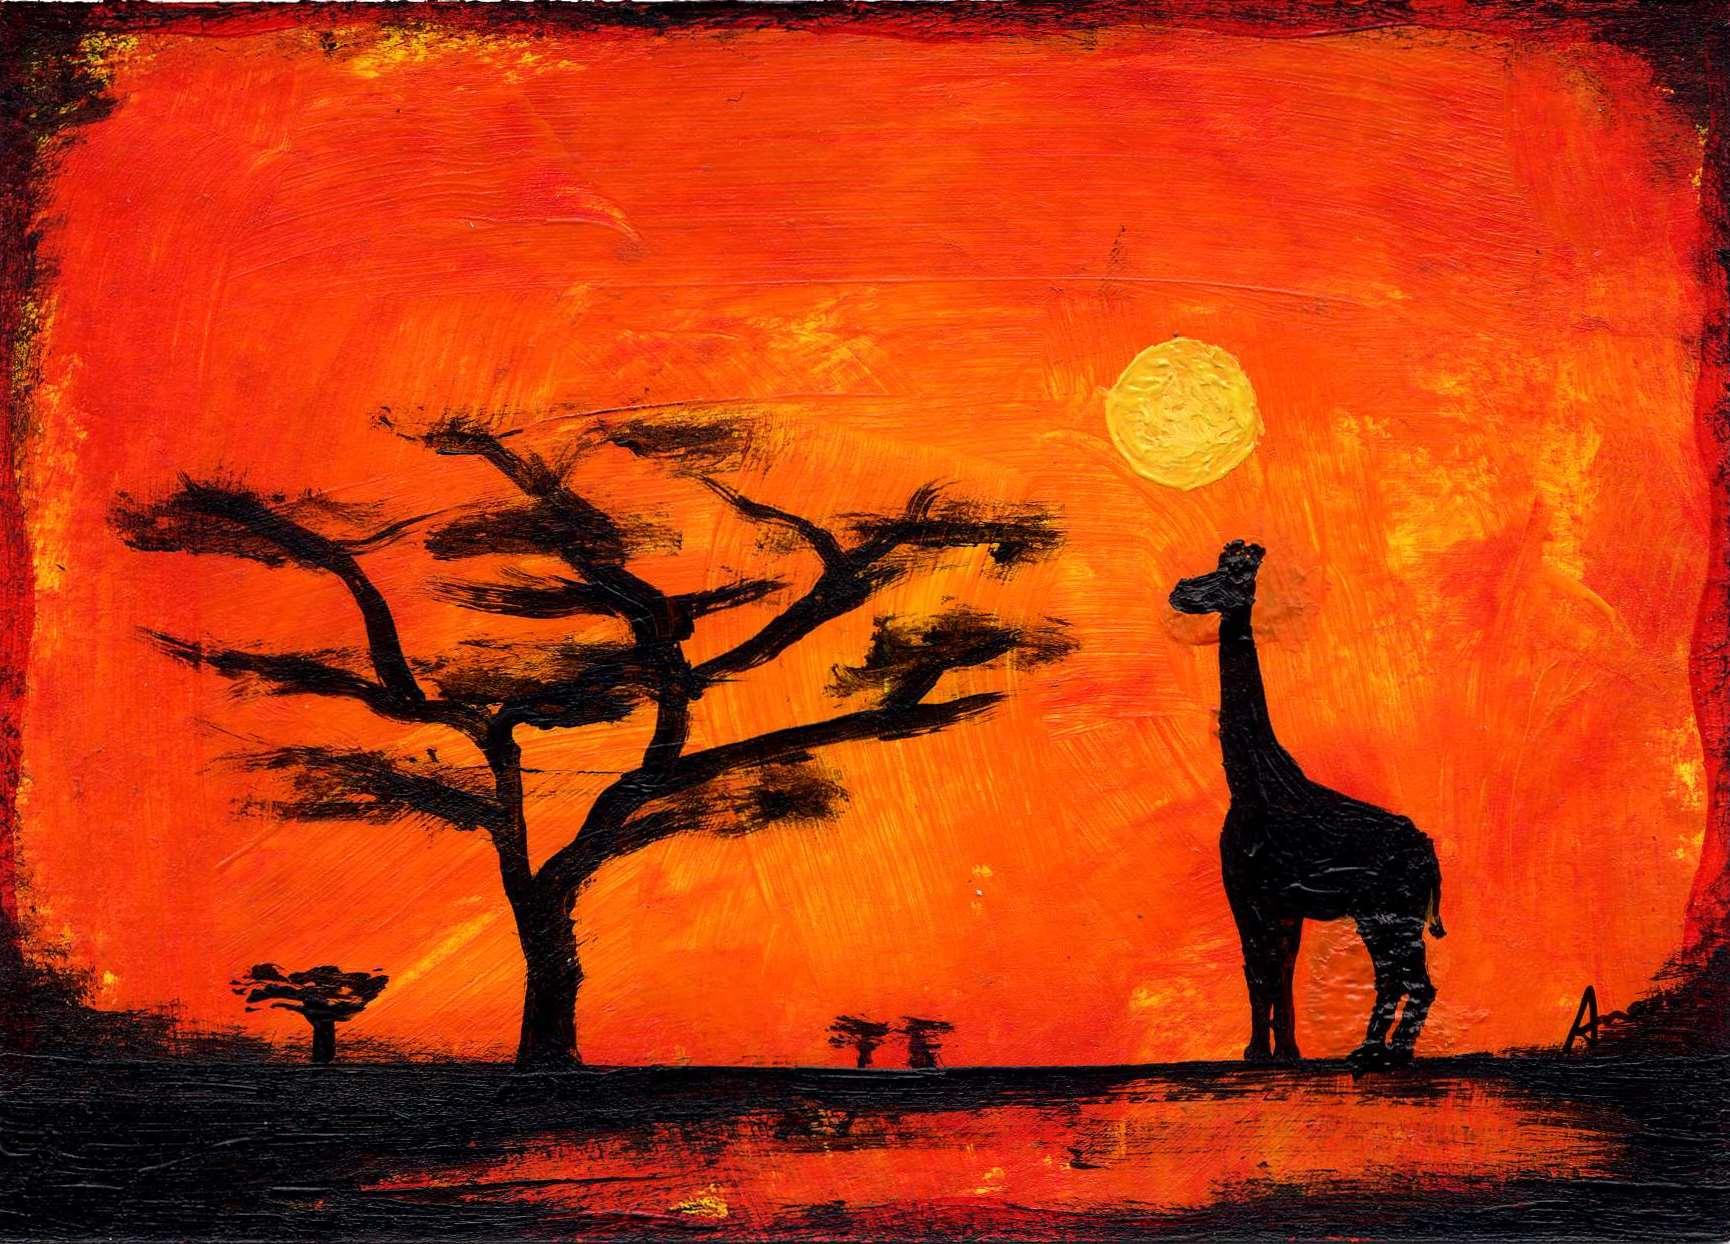 vhsafrikablack1